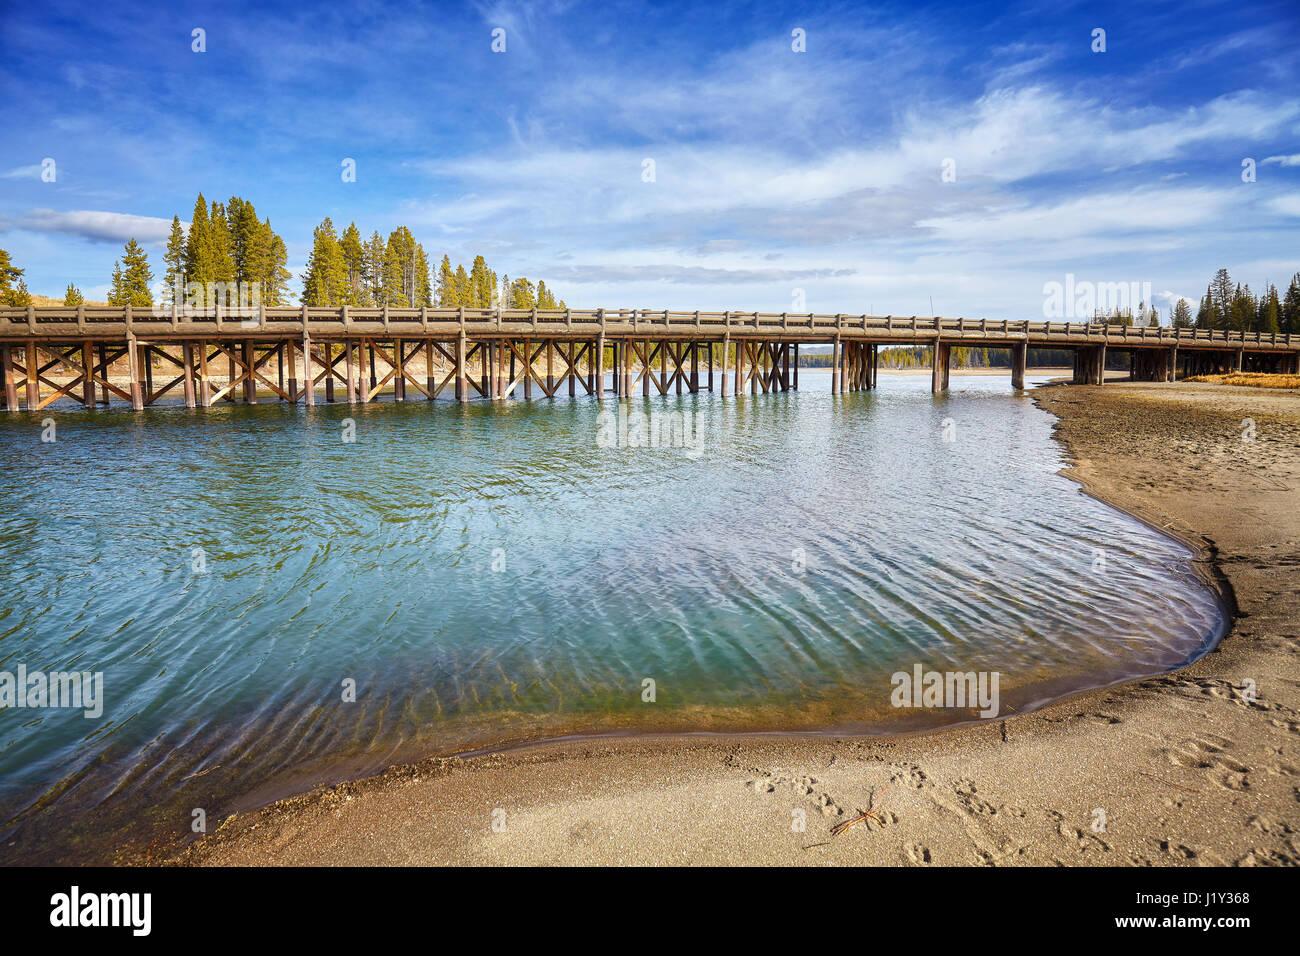 Angeln-Brücke im Yellowstone-Nationalpark, Wyoming, USA. Stockfoto